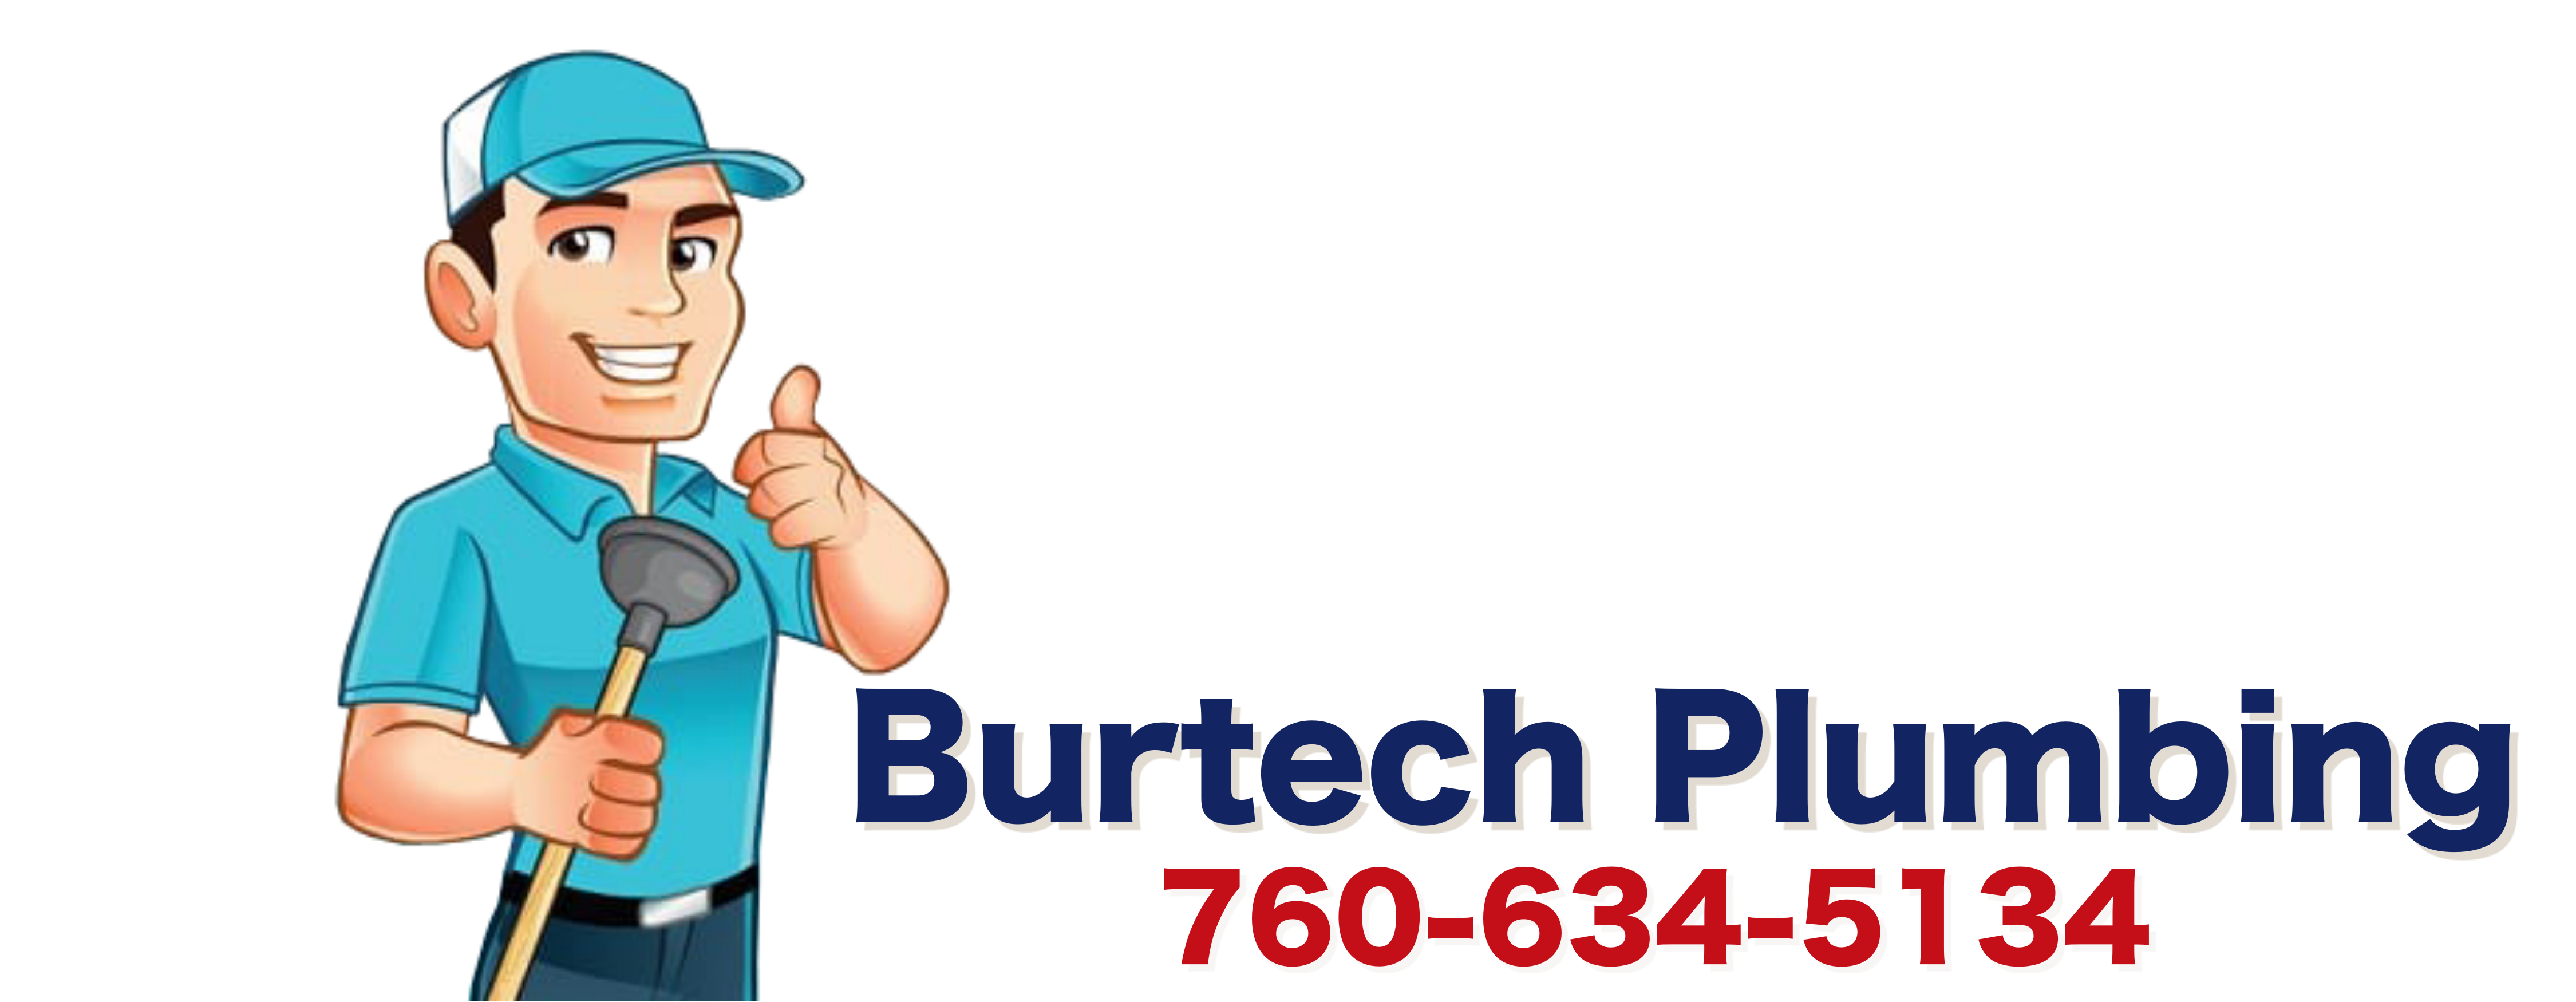 Burtech Plumbing | Your Trusted San Diego Plumbing Company